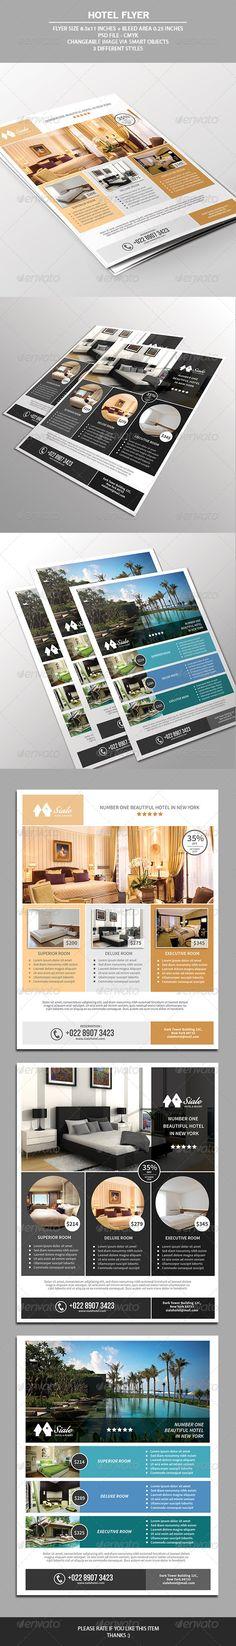 Hotel Brochure Hotel brochure, Brochures and Brochure template - hotel brochure template